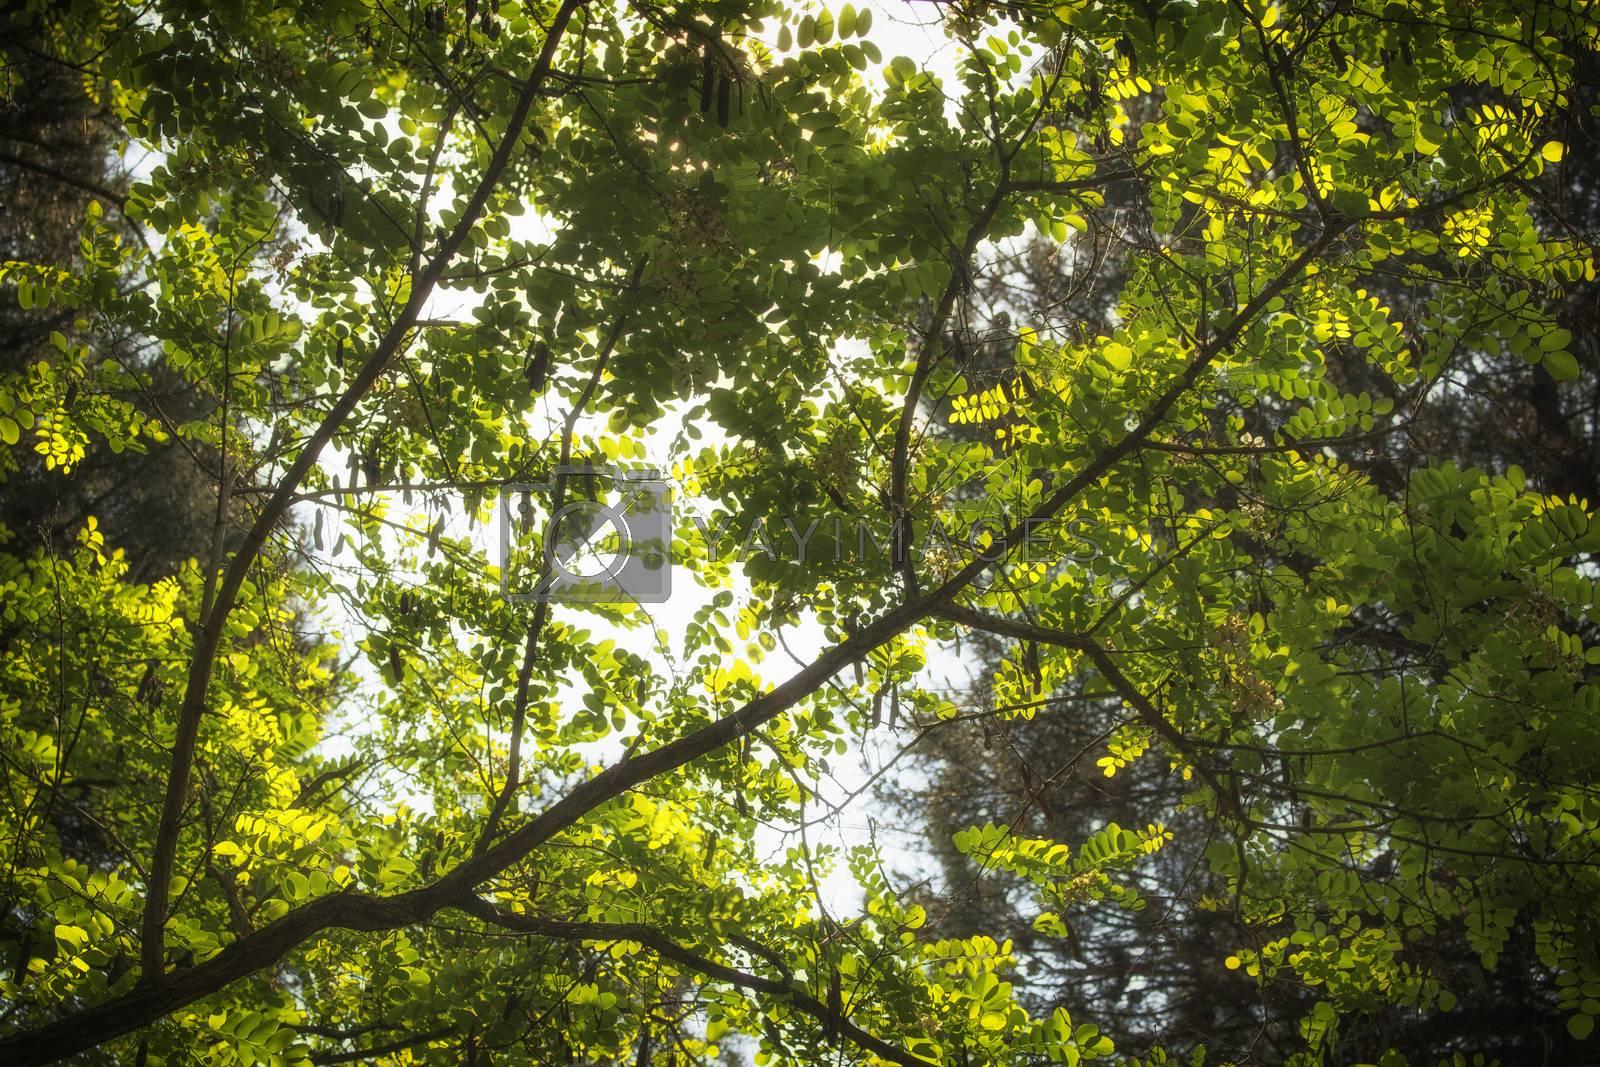 Green leaves, sun and sky in the pinewood forest along the Pialassa della Baiona brackish lagoon near Marina Romea on the  Adriatic seaside in Ravenna (Italy)